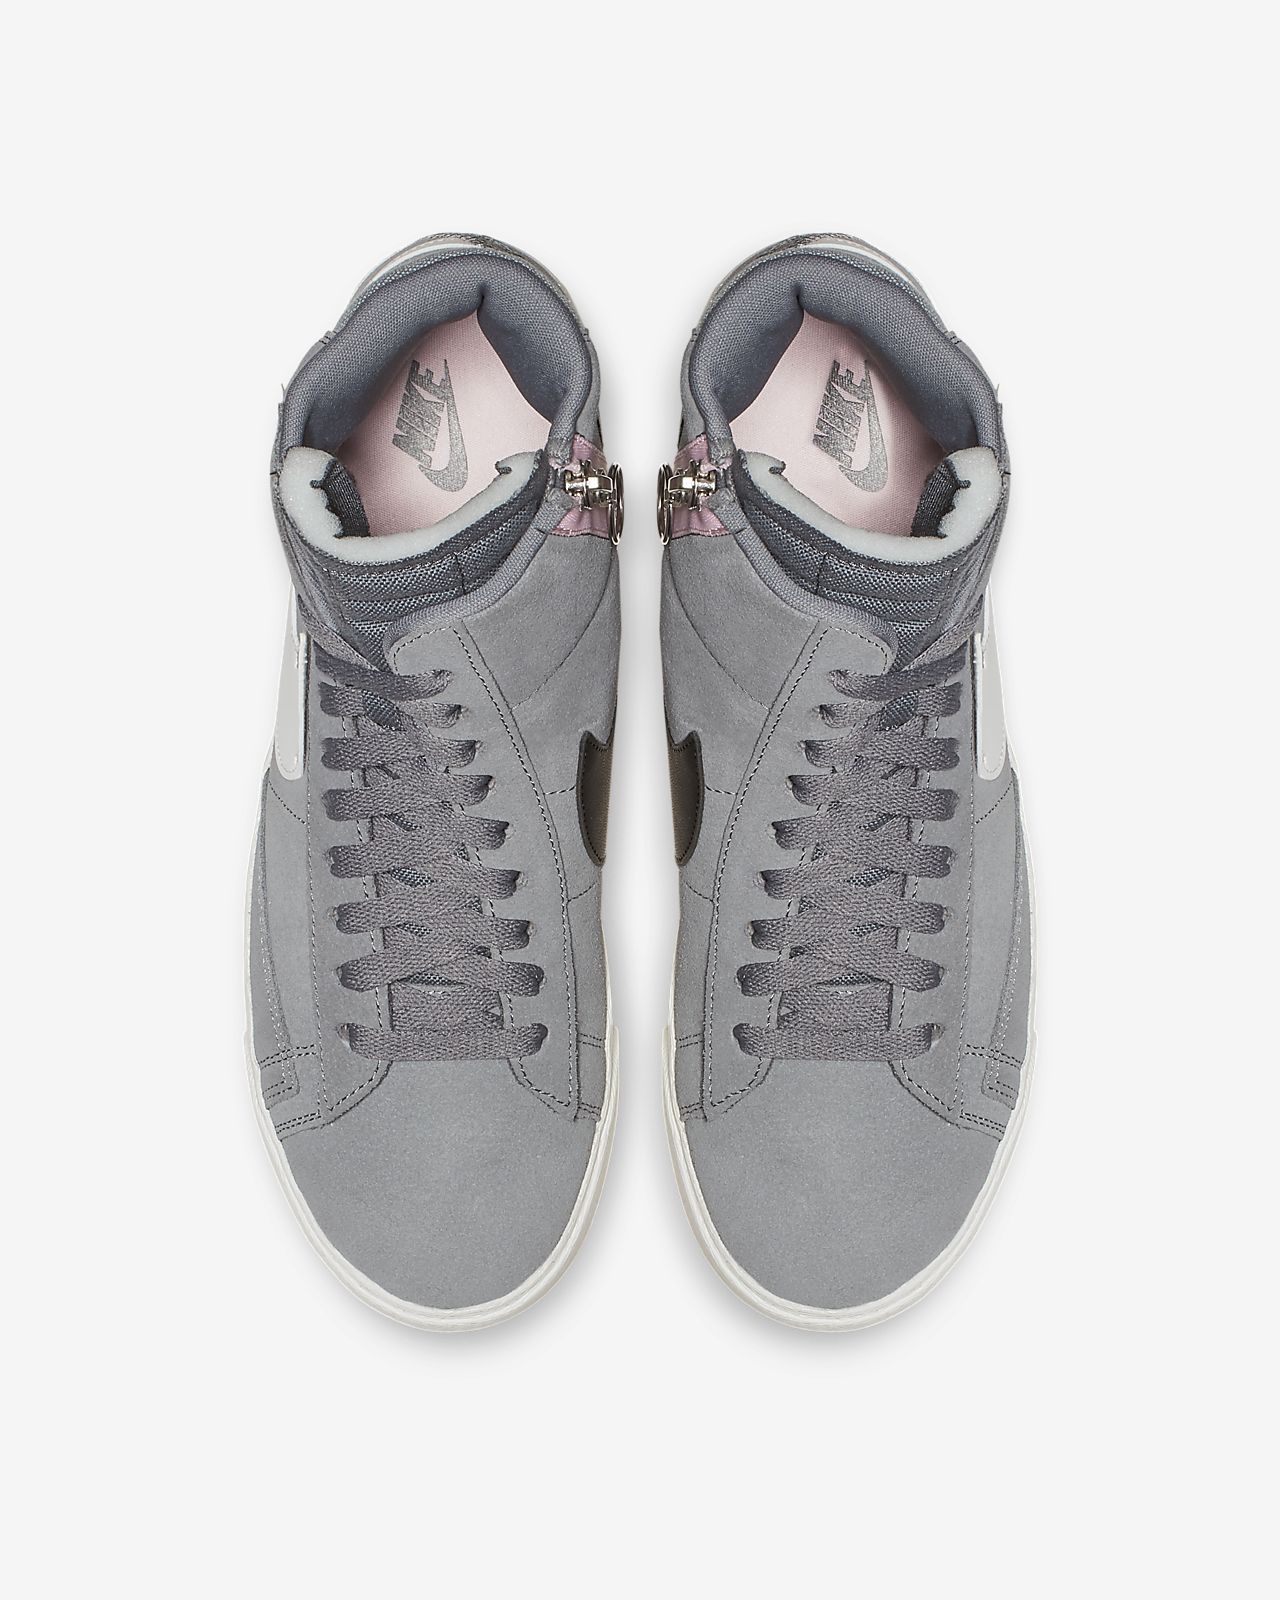 5184443391cb Legit Nike Sb Size Women Sneakers Jordan 5 Womens Japan